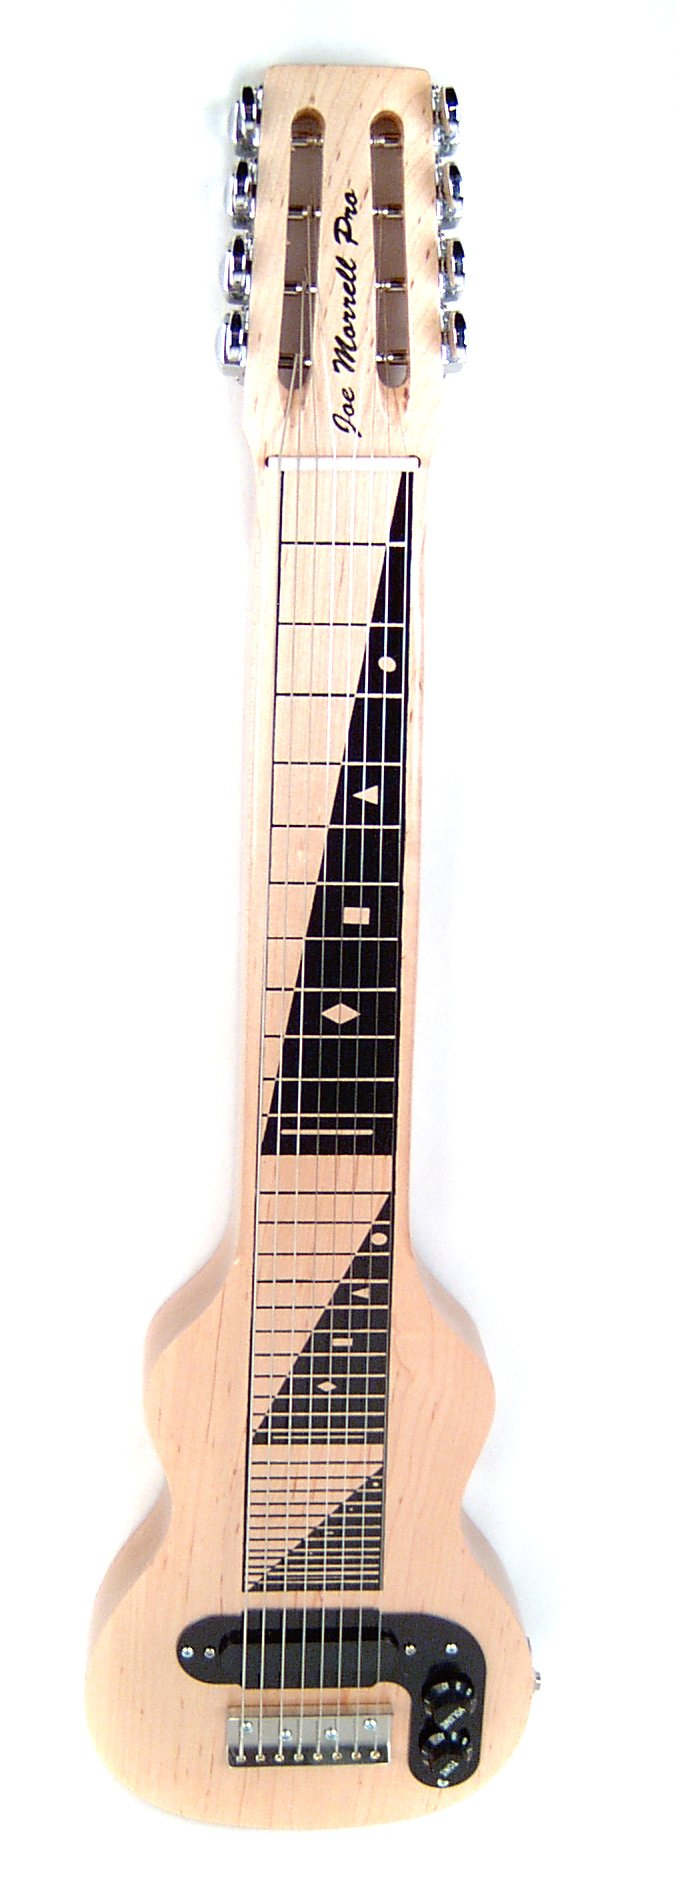 Morrell Joe Morrell Pro Series Maple Body 8-String Lap Steel Guitar - Natural Finish USA